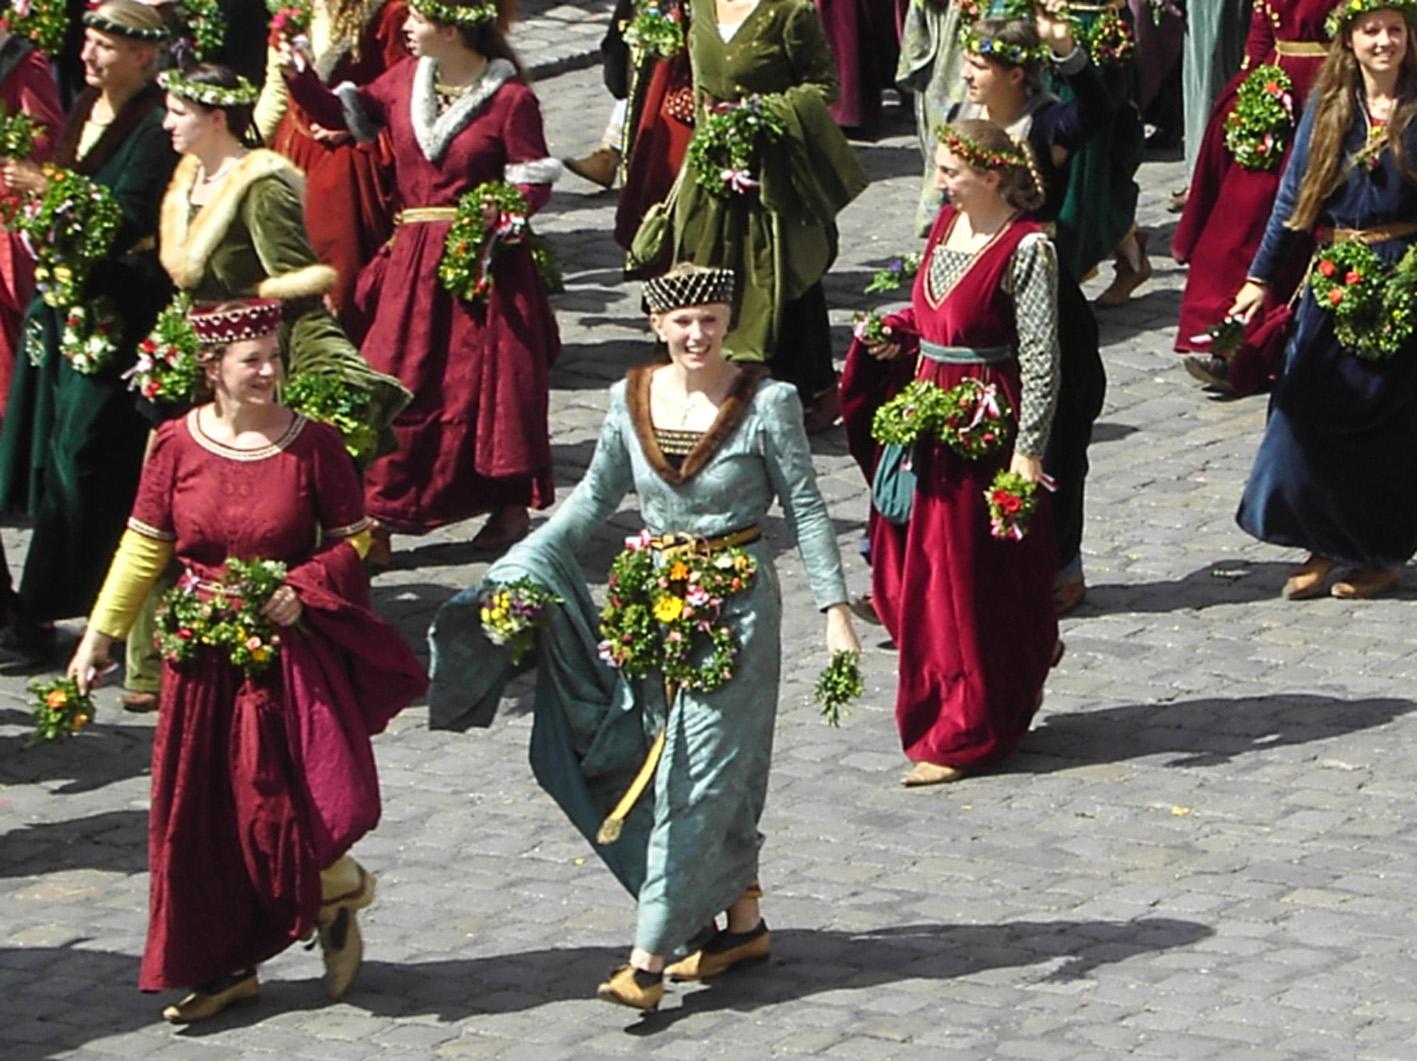 File:Landshuter Hochzeit 08.jpg - Wikimedia Commons